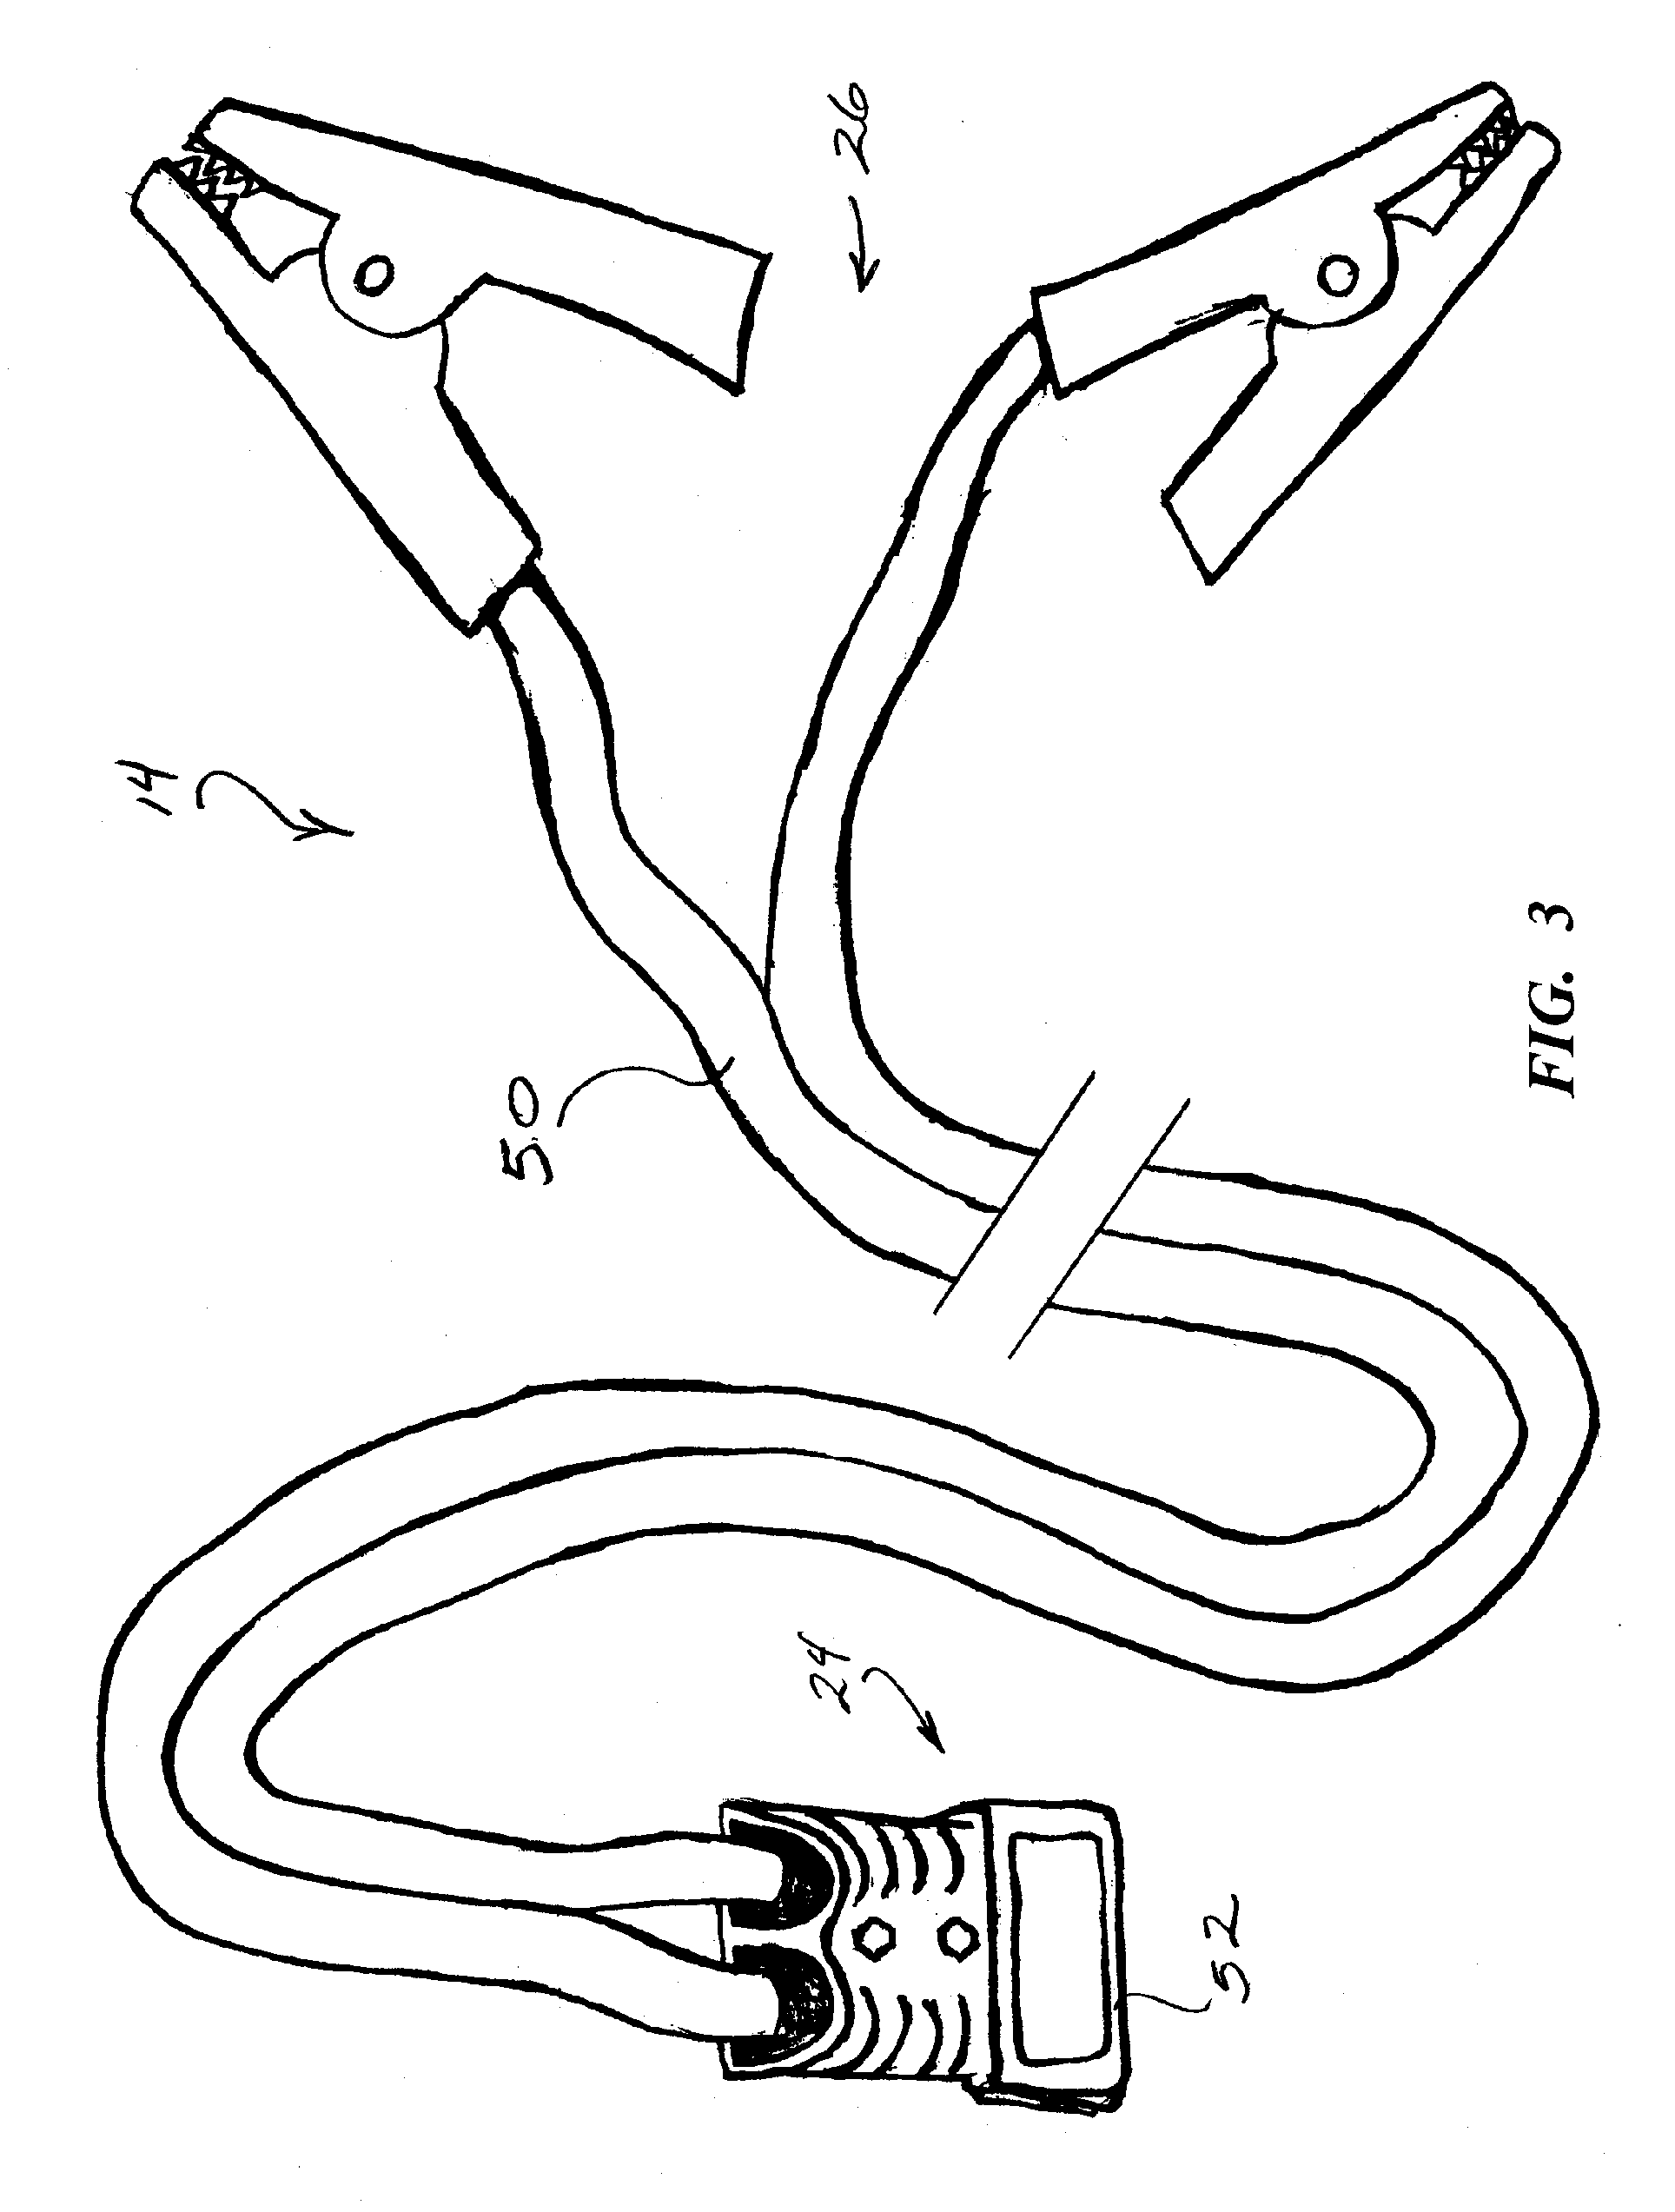 universal tow bar wiring harness